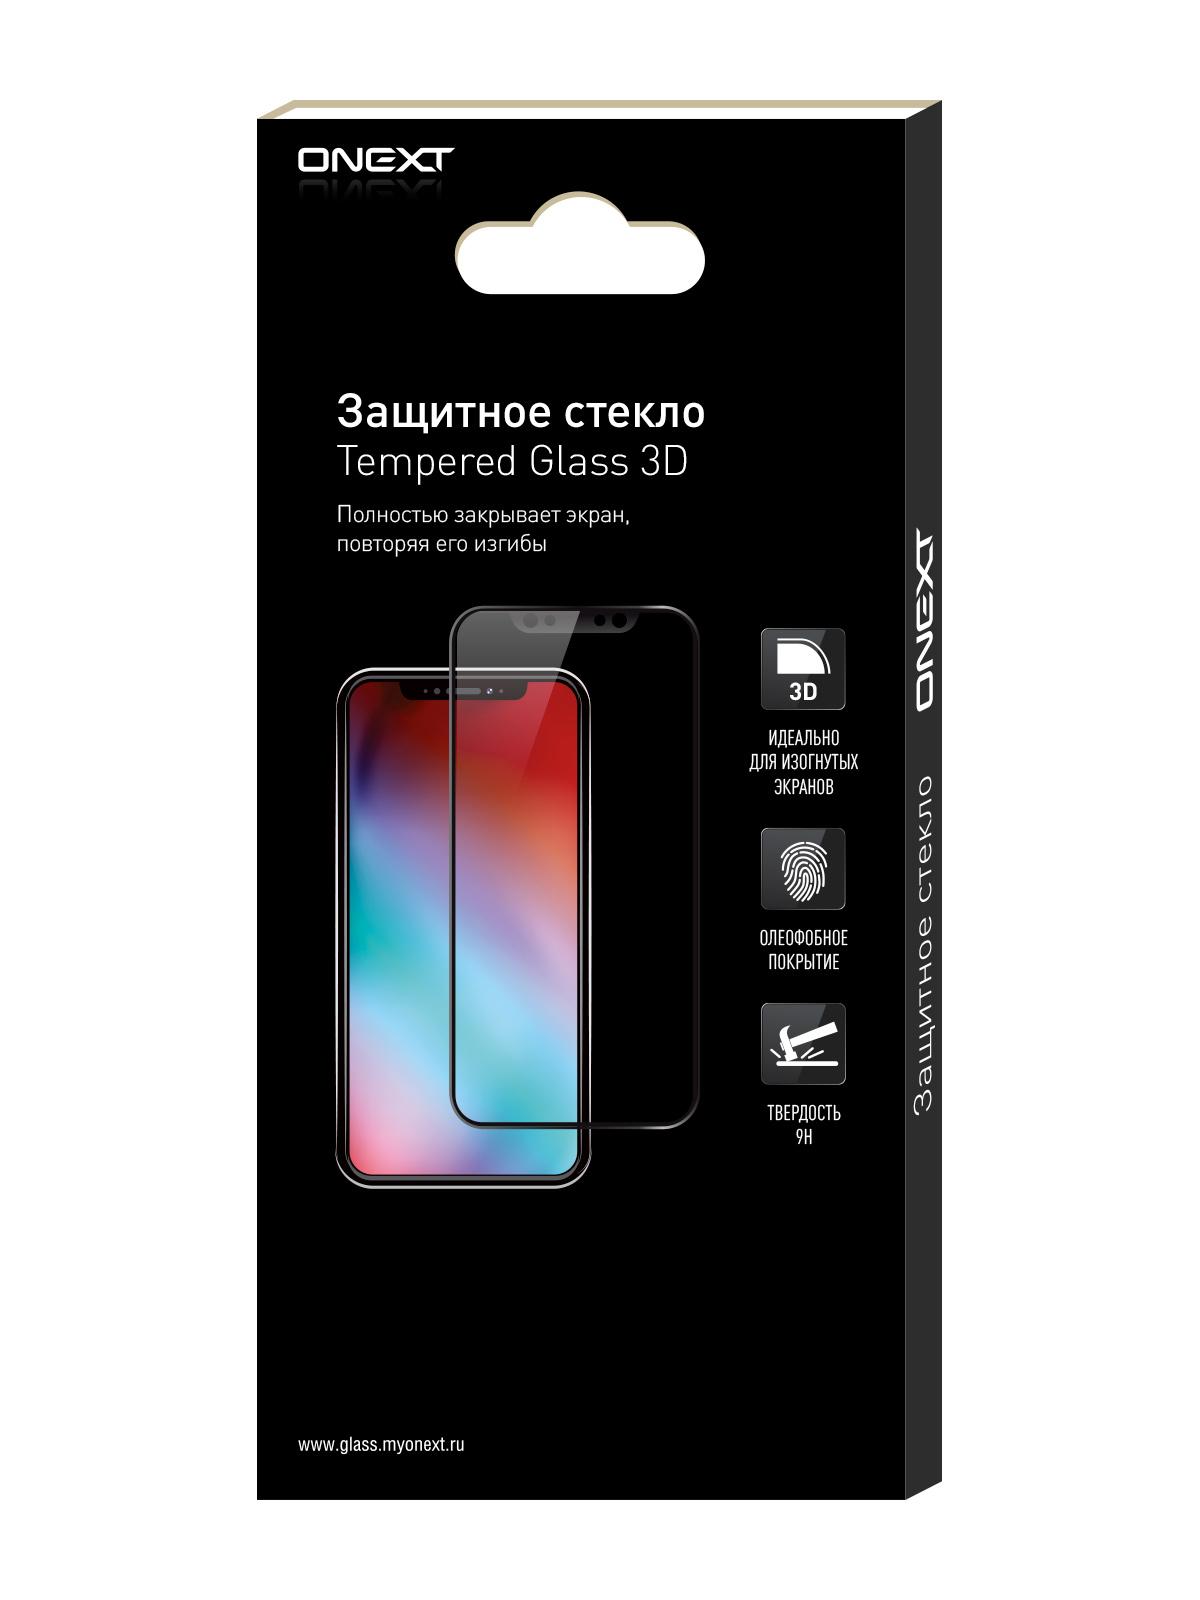 Защитное стекло ONEXT iPhone 6/6S 3D